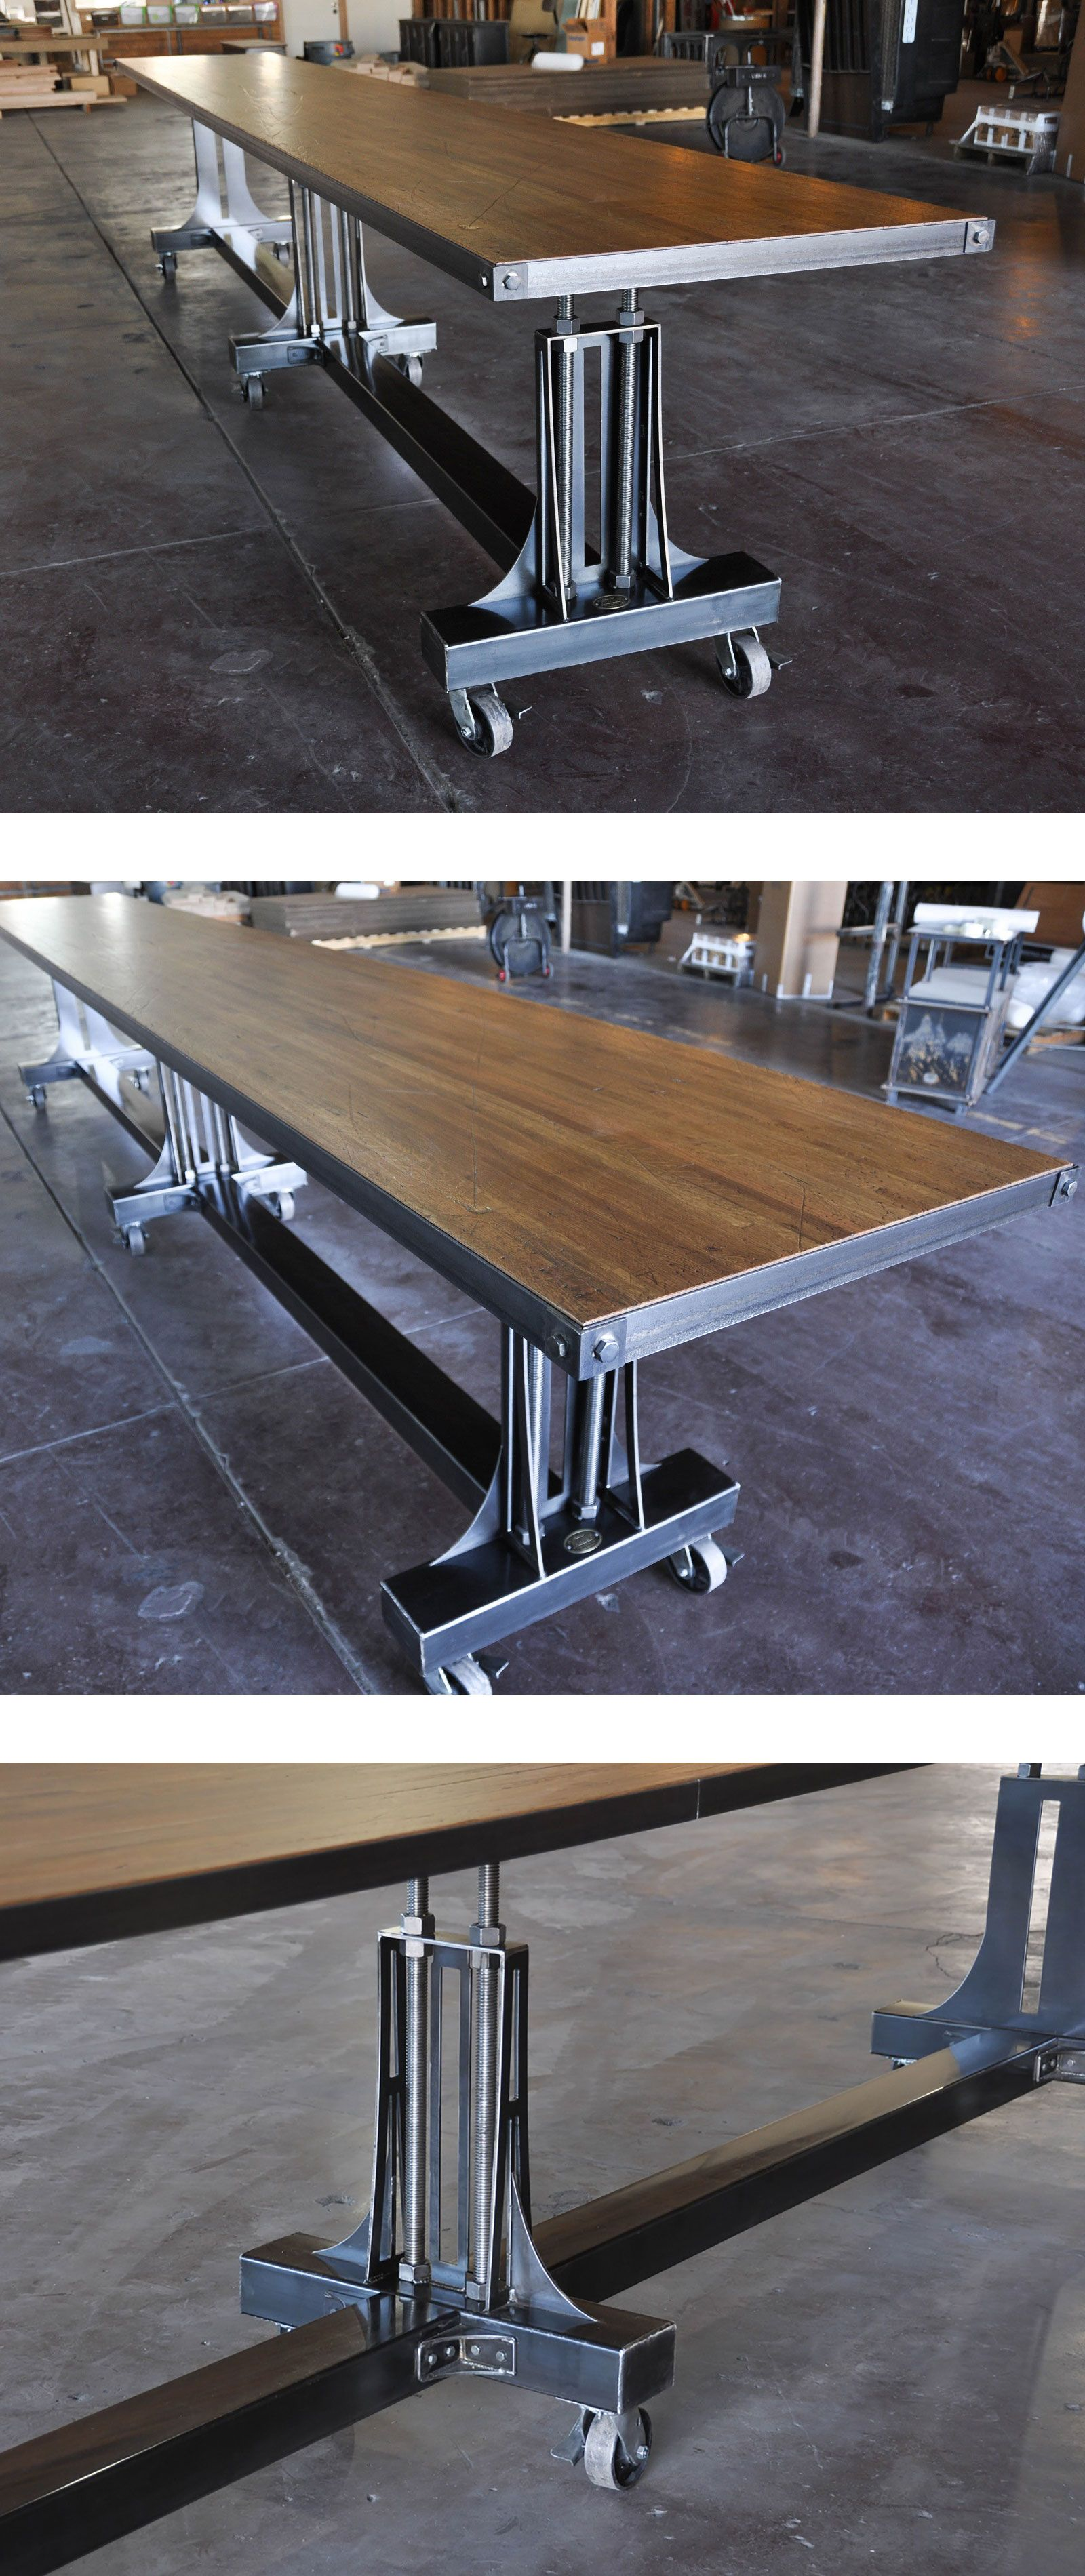 Post Industrial Table by Vintage Industrial Furniture in Phoenix, AZ ...